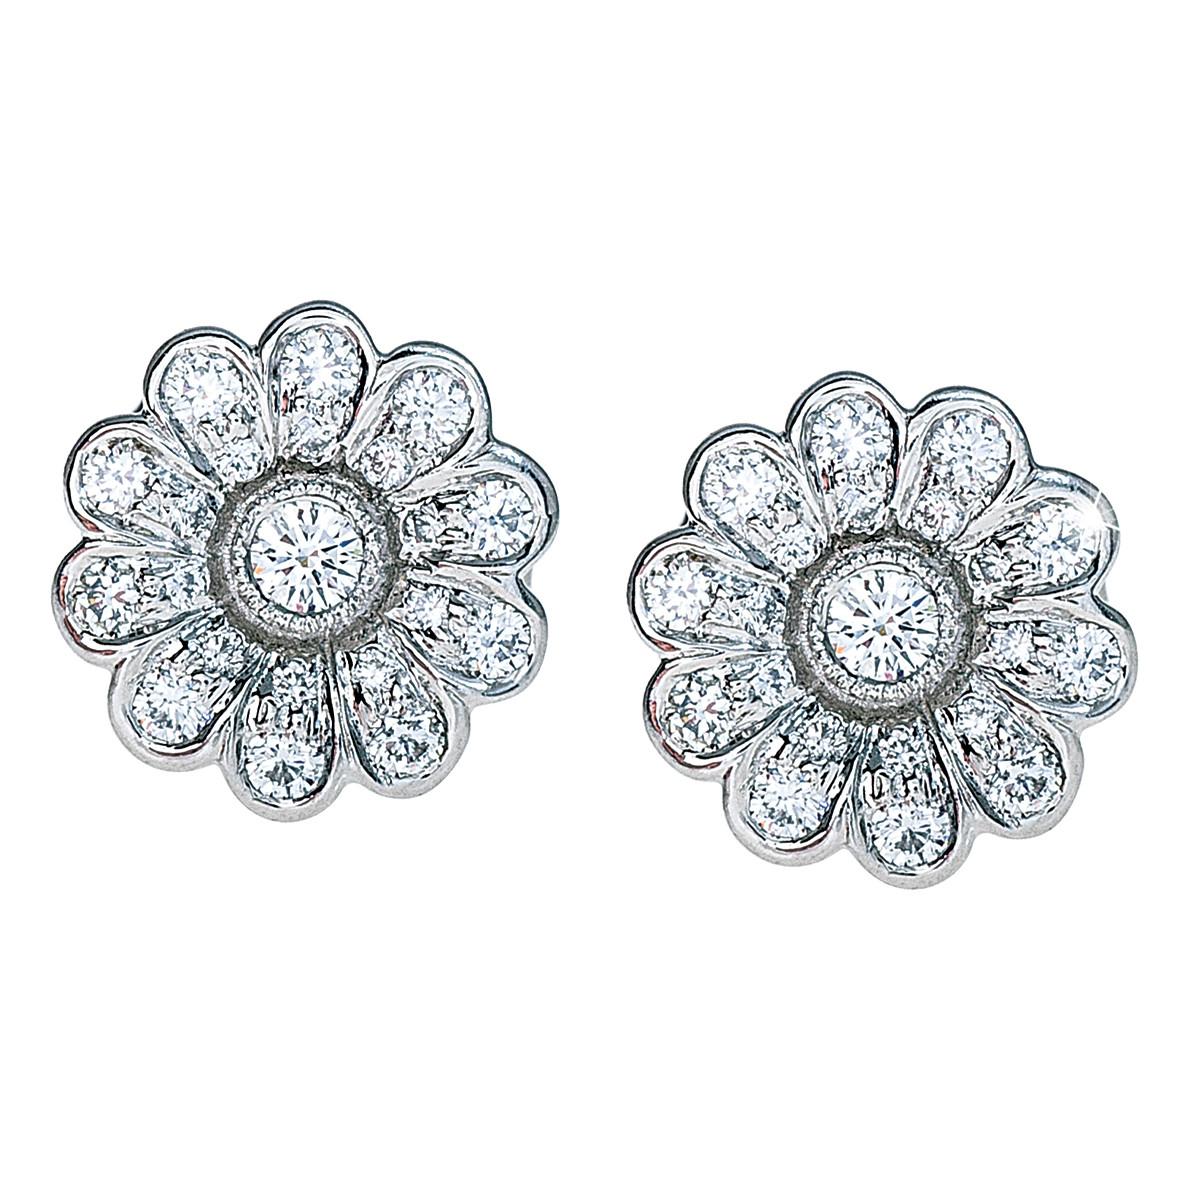 Vintage Tiffany & Co. 0.28 CTW Diamond Studs